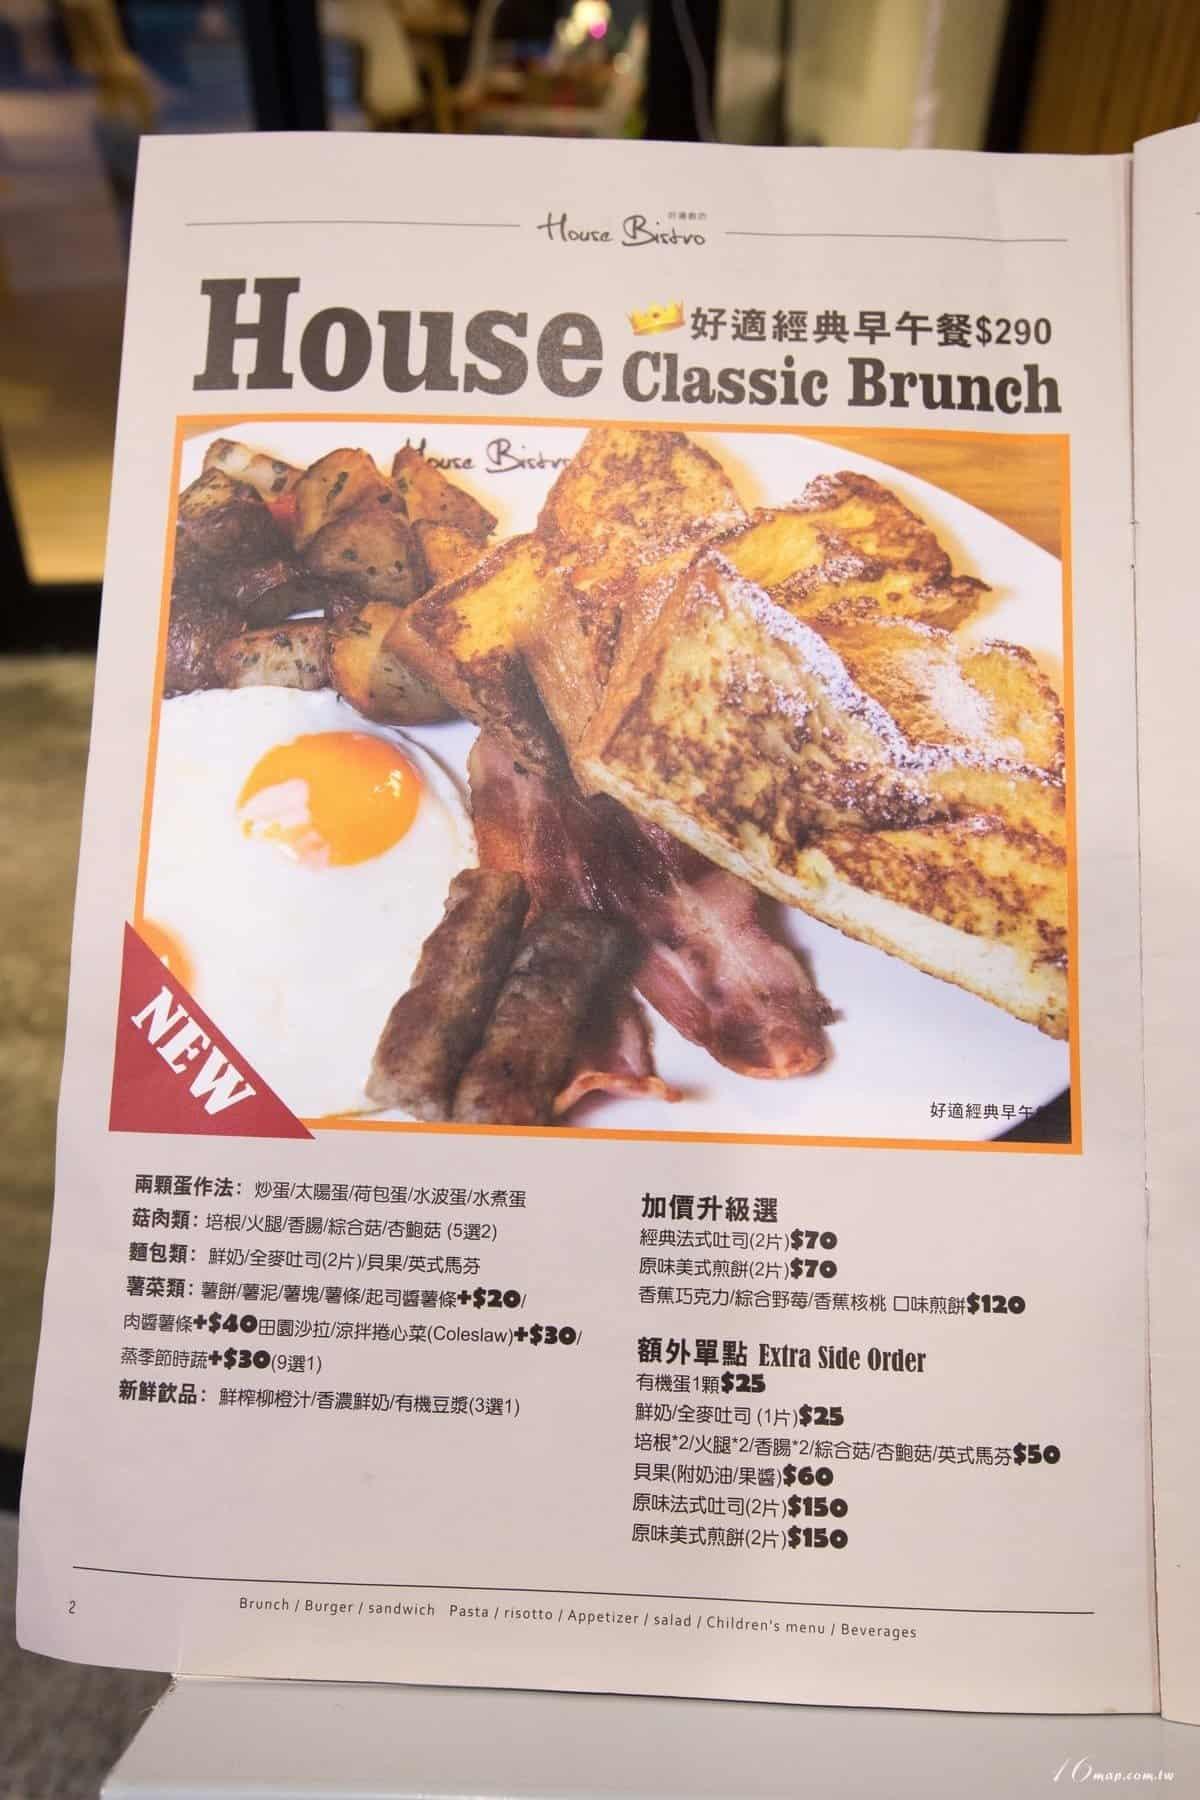 Housebistro-menu-1